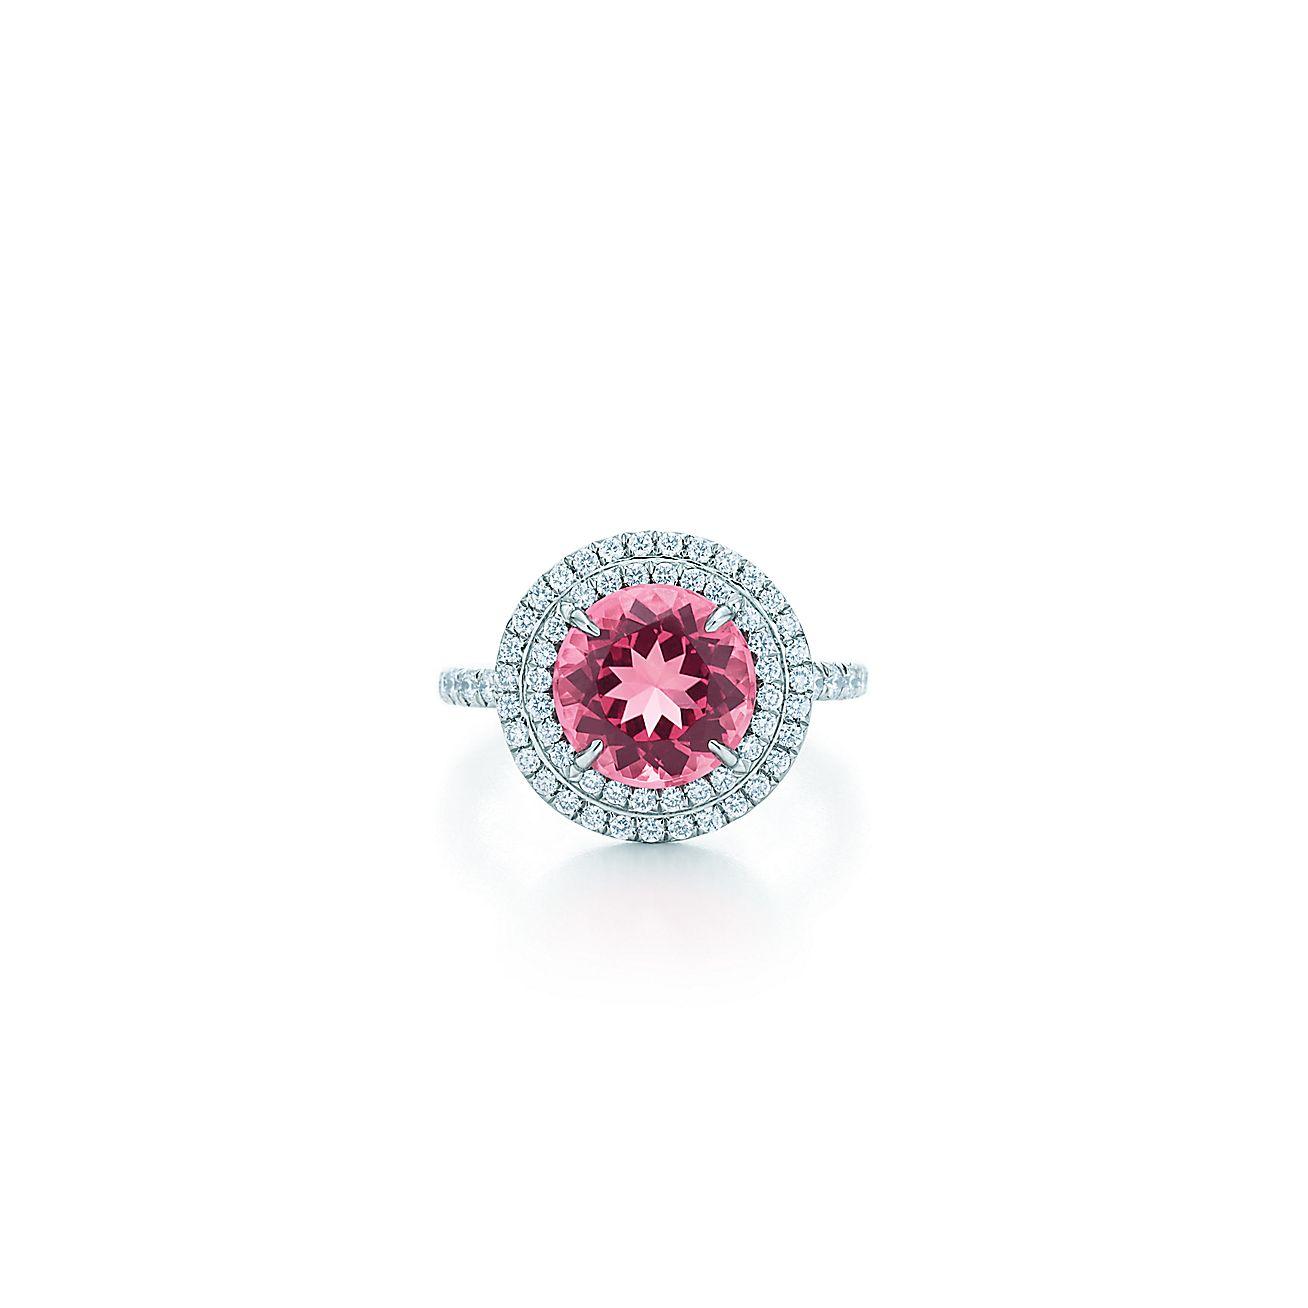 Tiffany Soleste® Ring